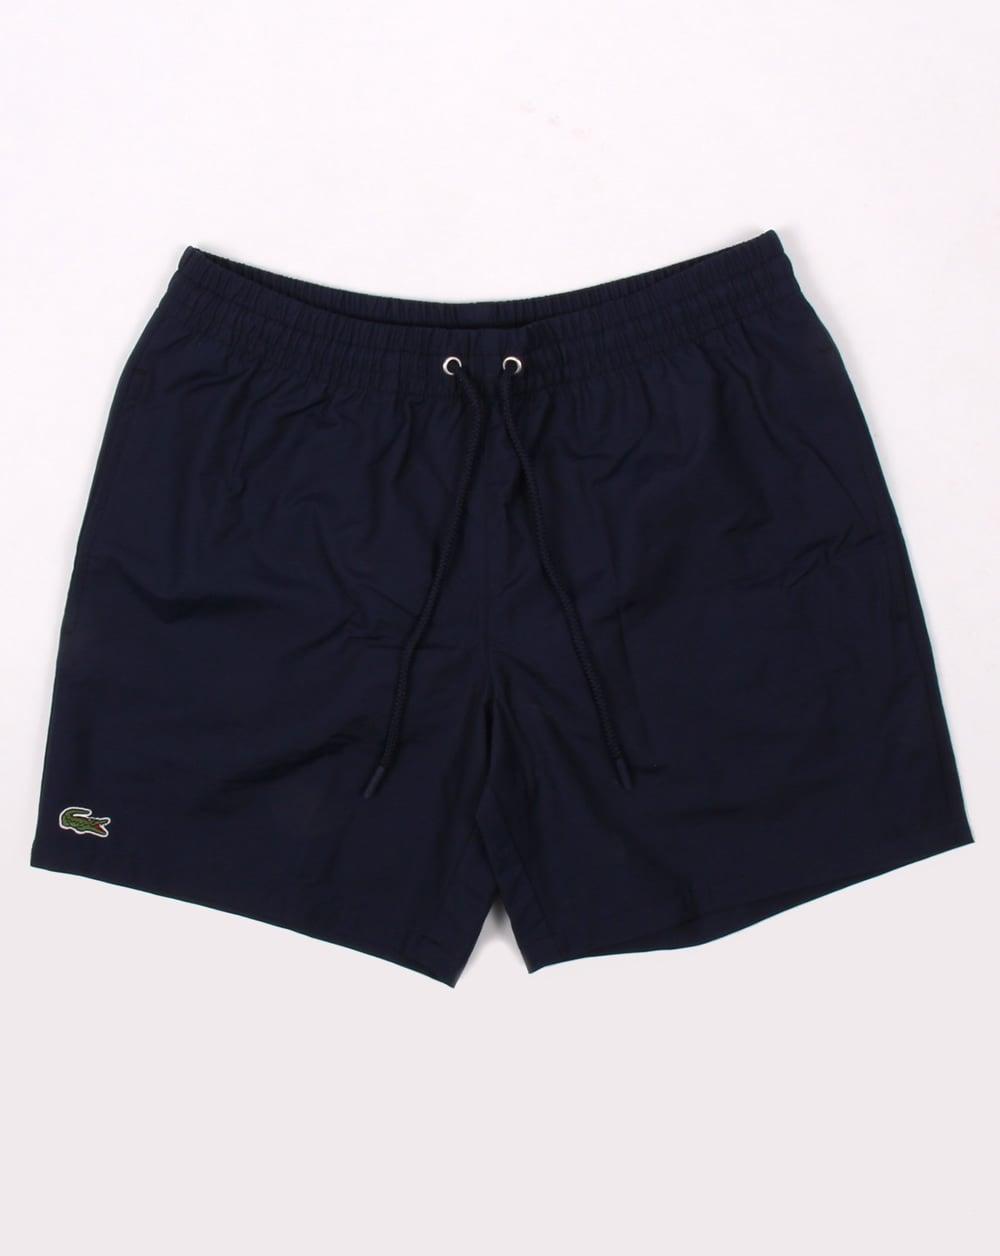 ba6da0d92614b Lacoste Lacoste Swim Shorts Navy/navy